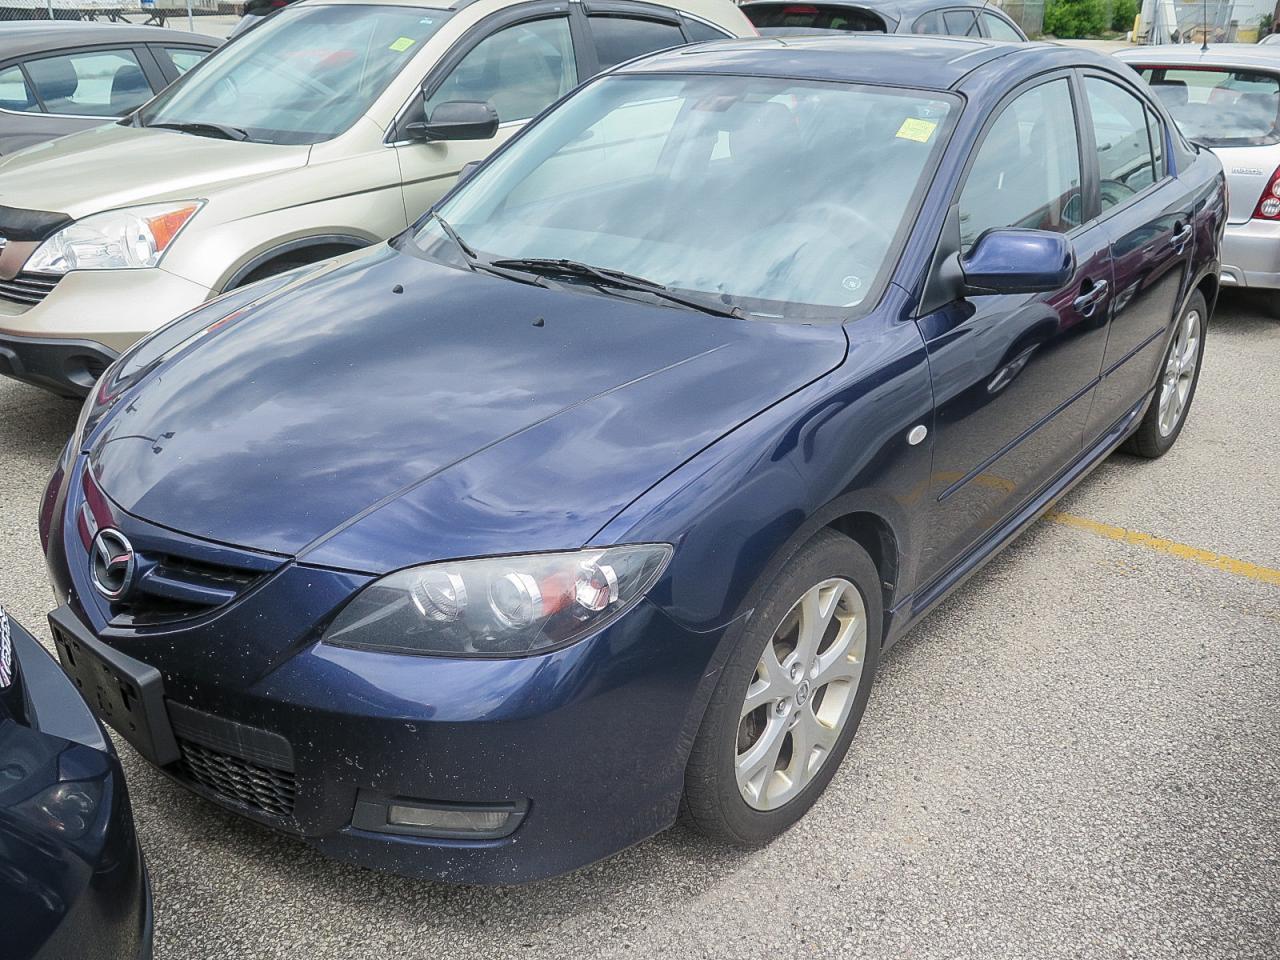 2008 Mazda MAZDA3 GT AUTOMATIC LOADED!!!